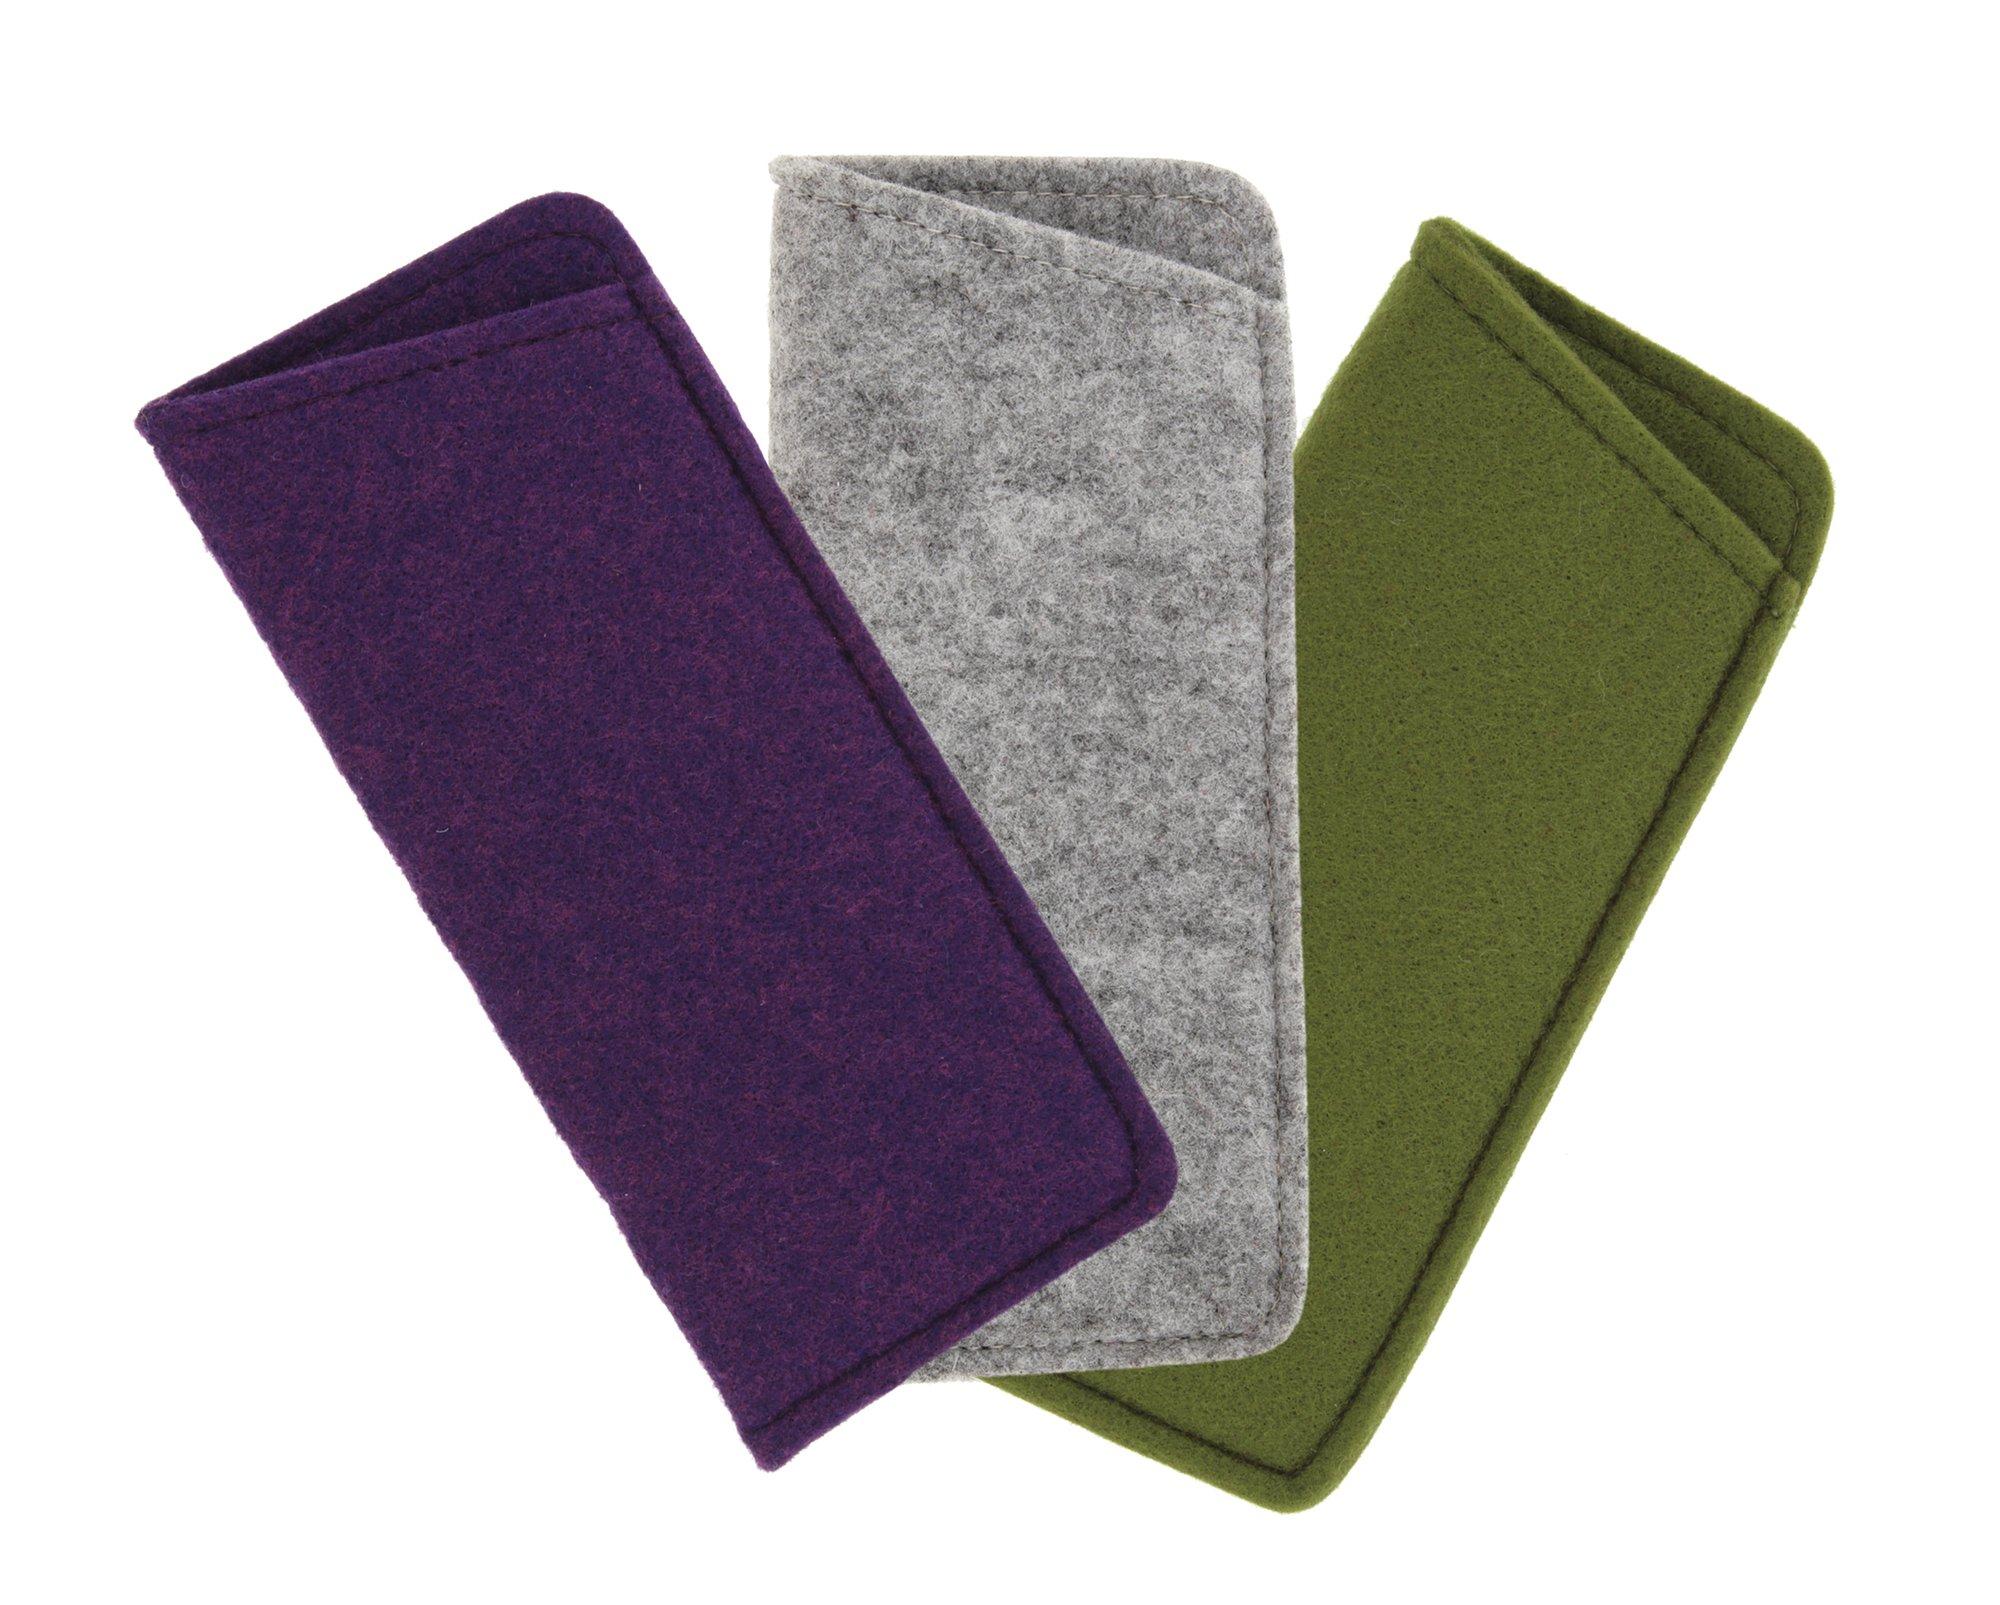 3 Pack Soft Felt Eyeglass Slip Cases, Small To Medium, Purple/Gray/Olive